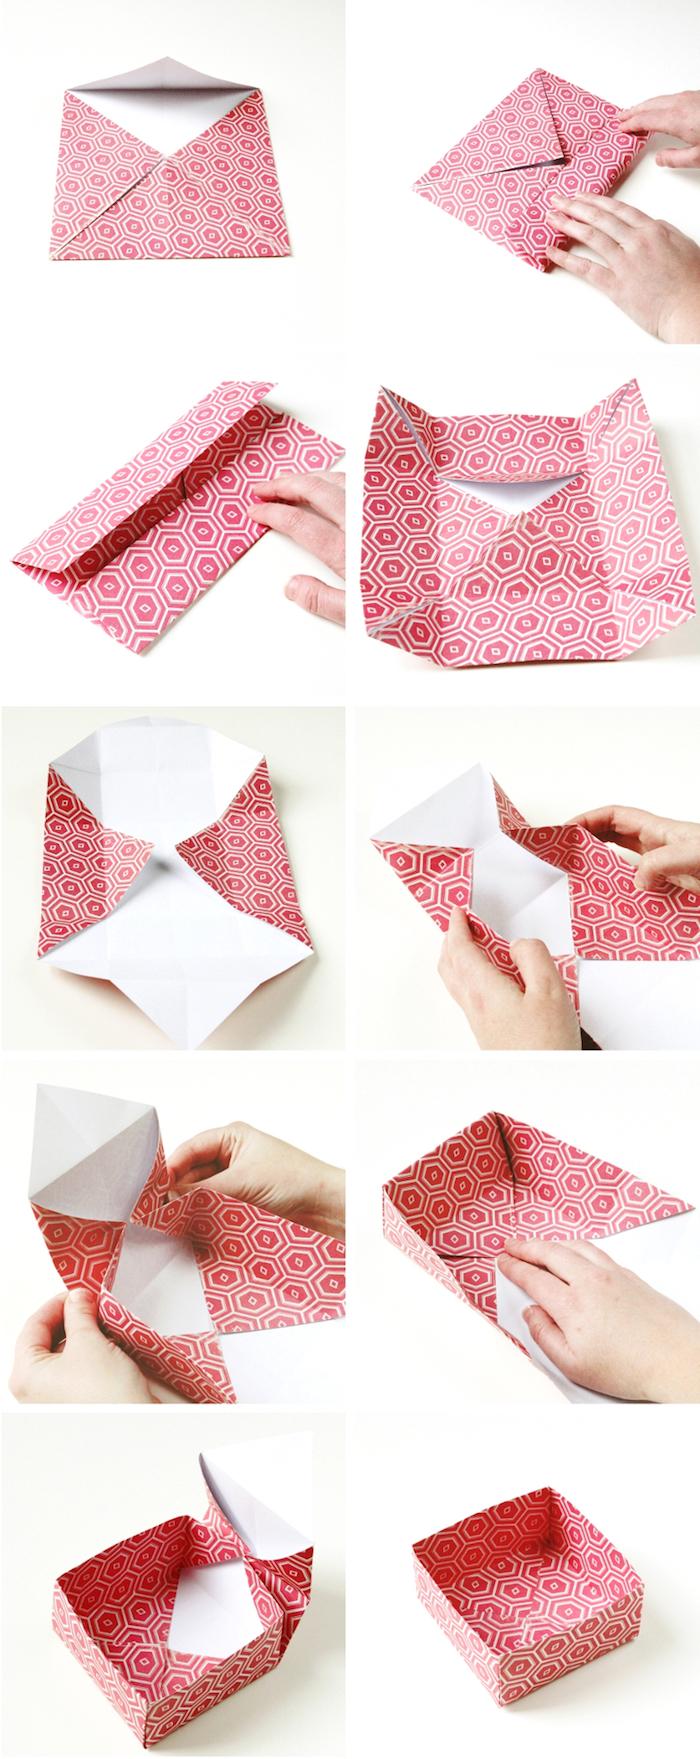 geschenkbox weihanchten, origami falten anleitung, basteln mit papier, geschenkverpackung